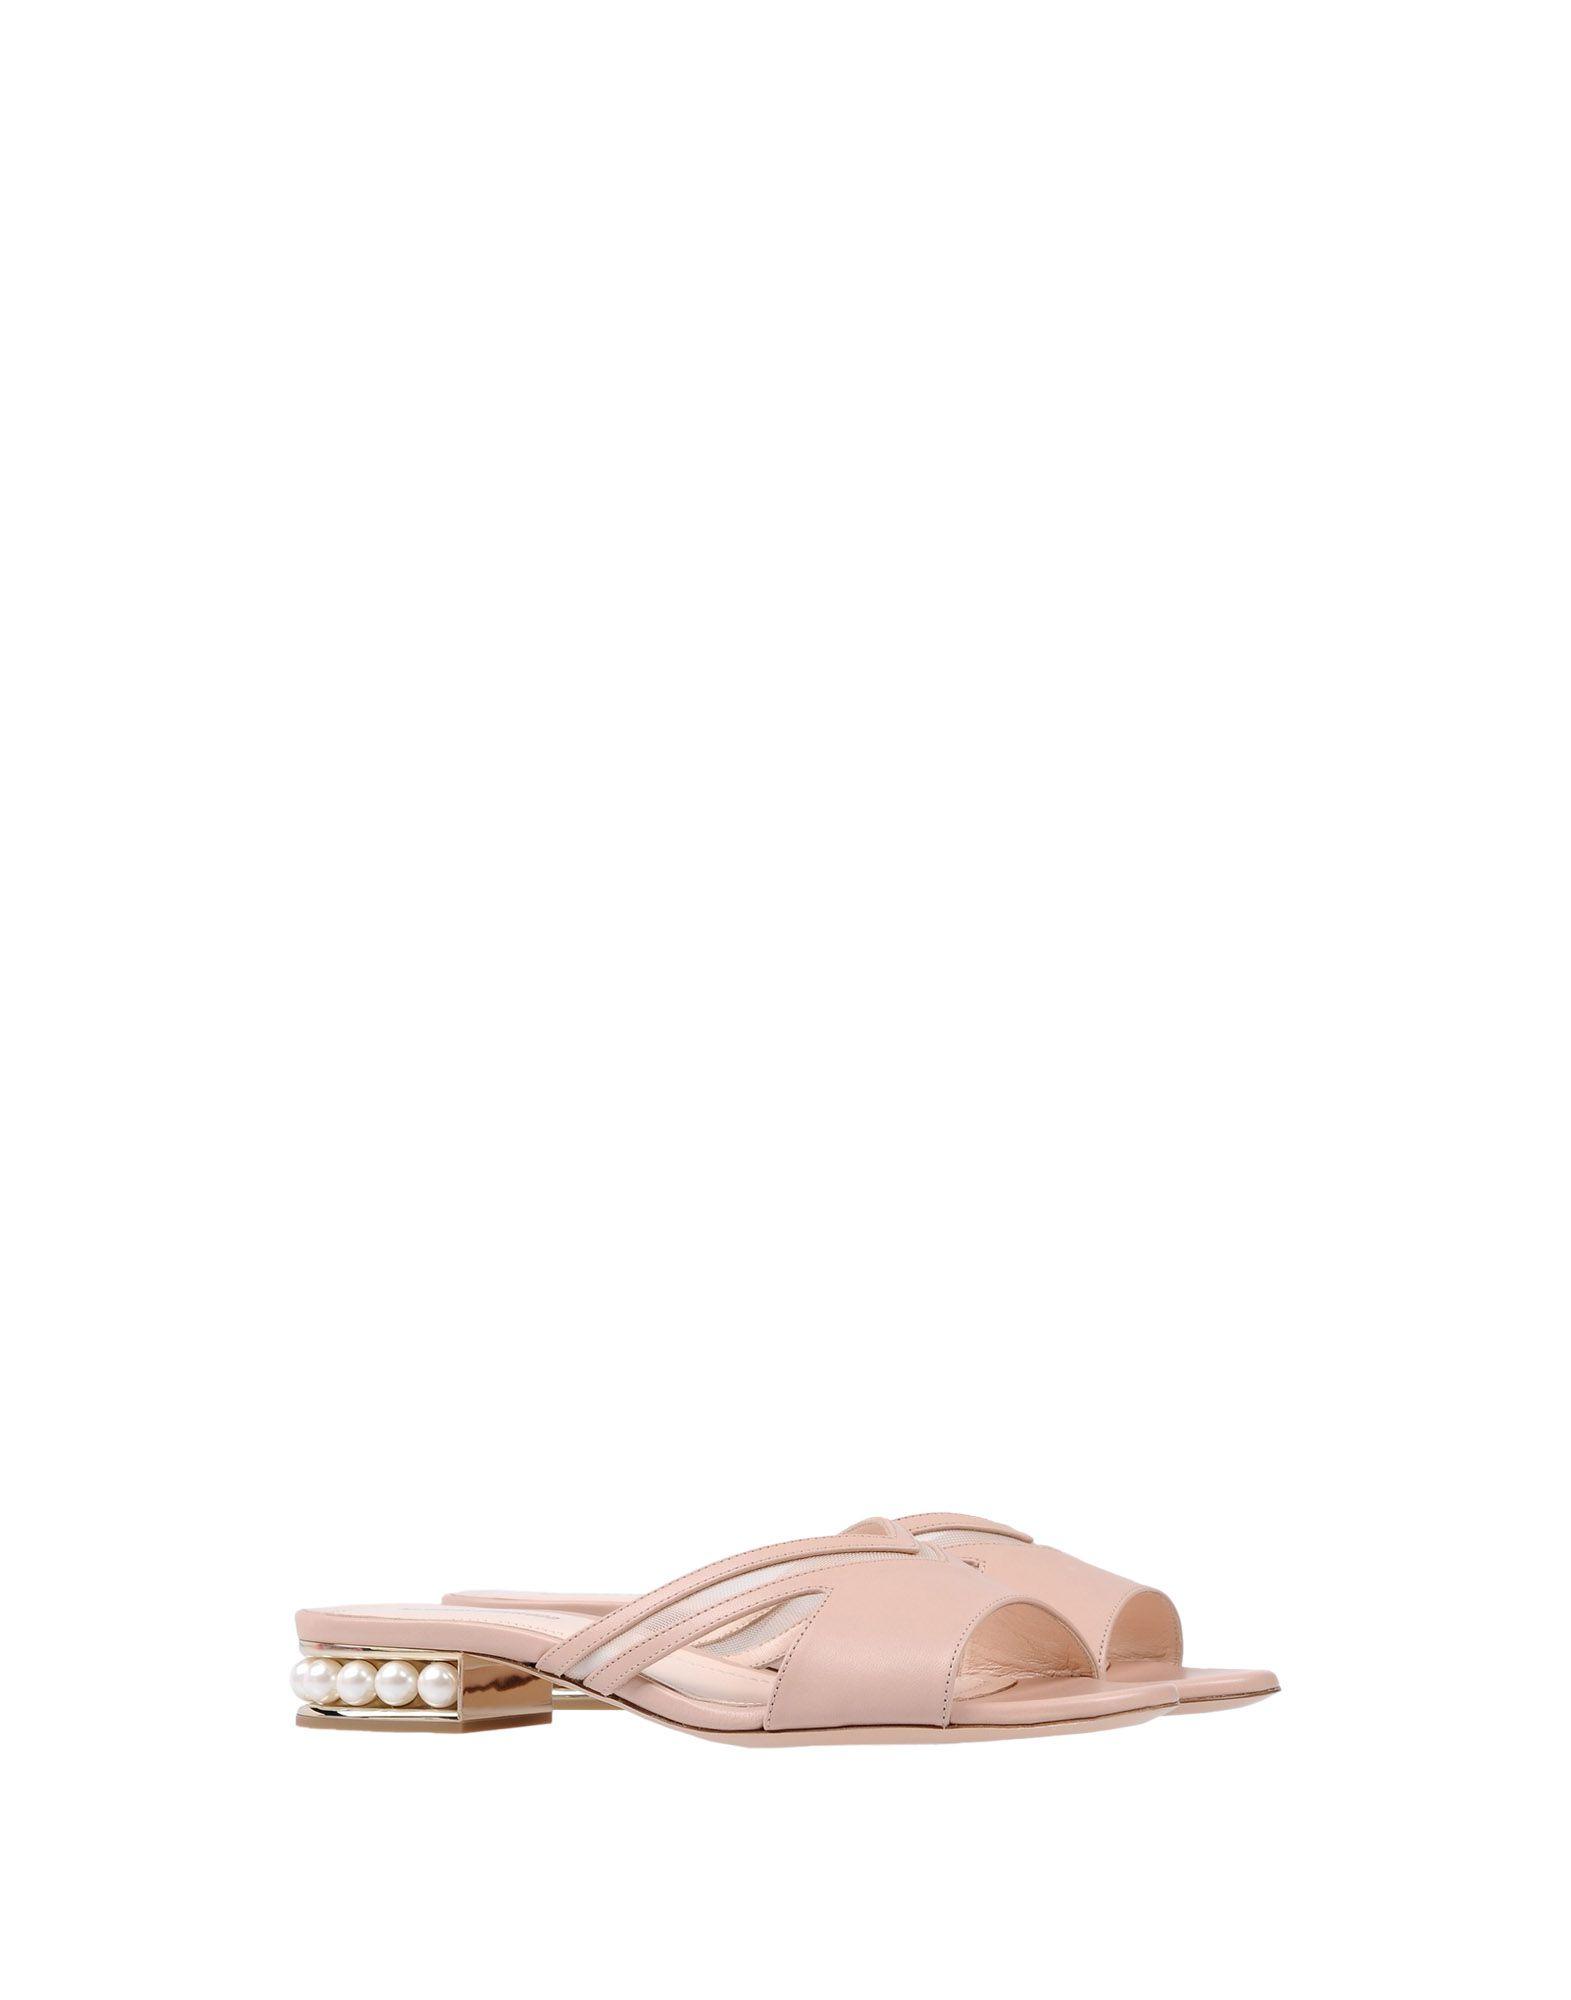 Nicholas Kirkwood Sandalen Damen aussehende  11519148JUGünstige gut aussehende Damen Schuhe 371778